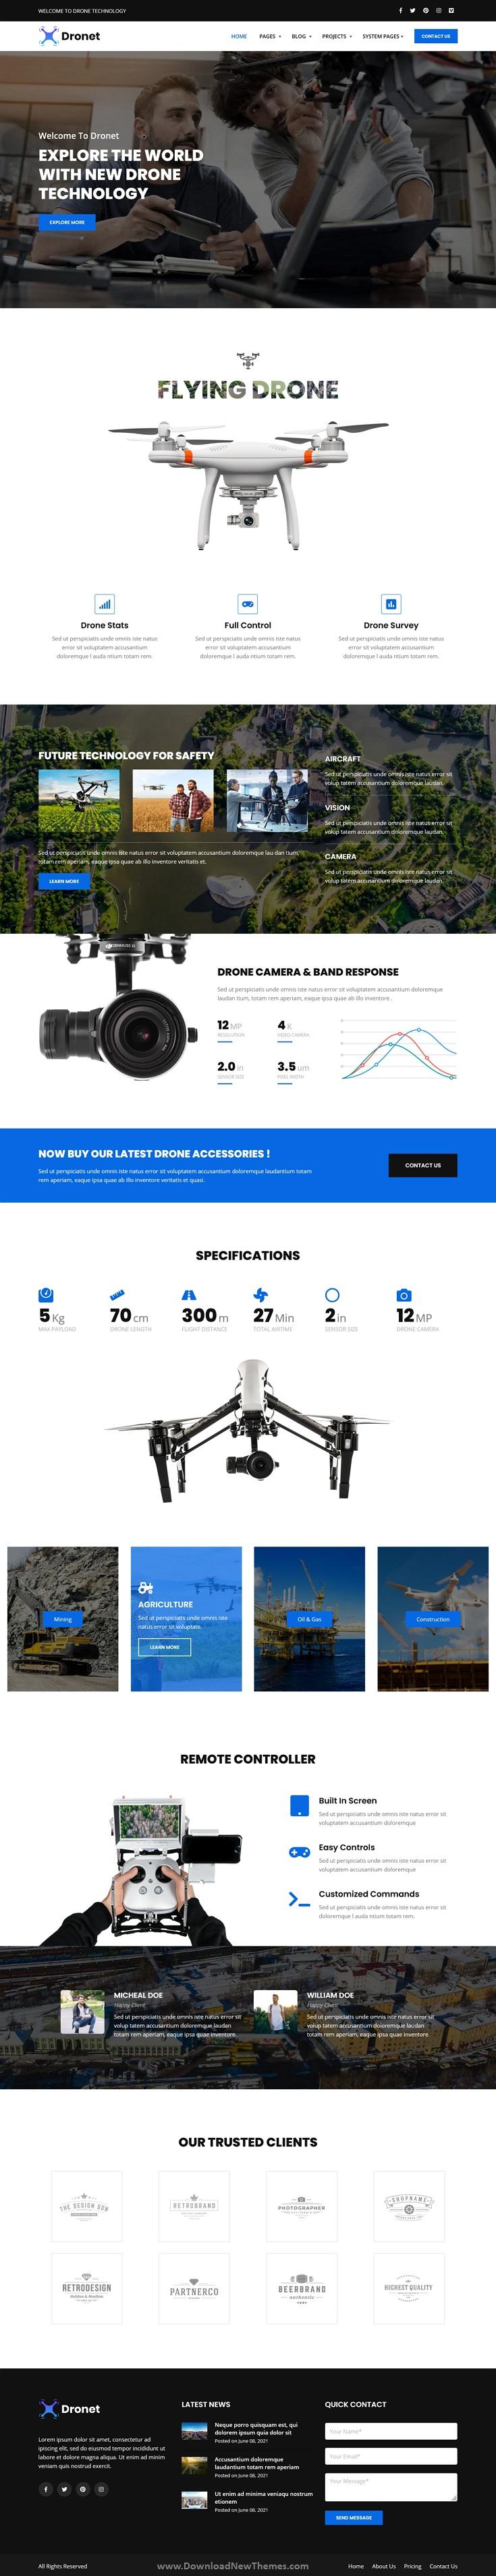 Drone & UAV Business HubSpot Theme